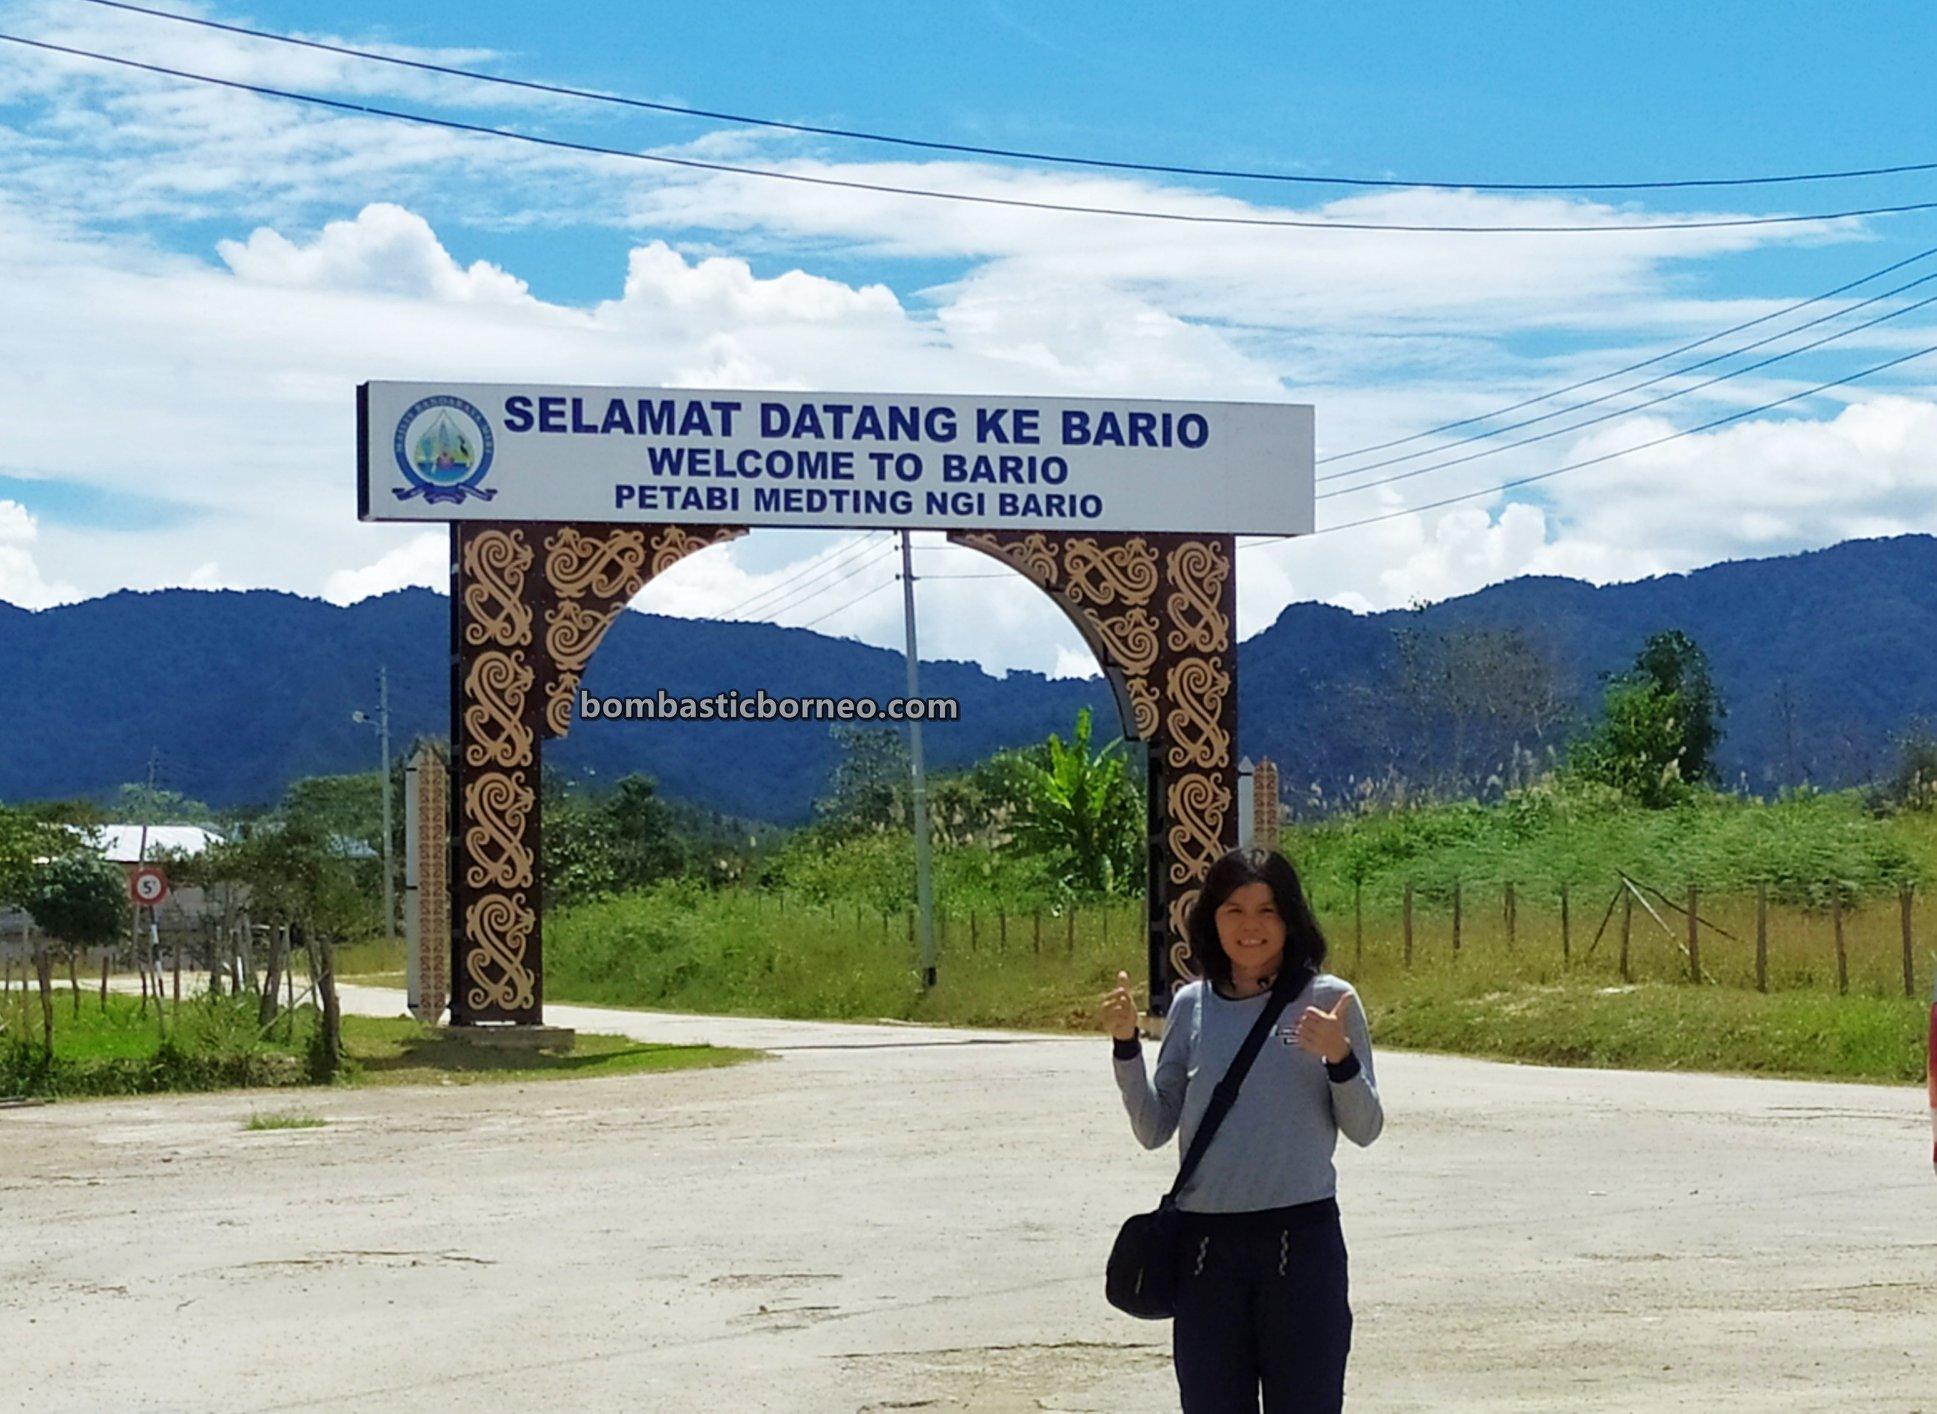 Bario airport, Kelabit Highlands, adventure, authentic, backpackers, exploration, Interior village, native, orang ulu, Malaysia, Sarawak, Tourism, travel guide, Cross Border, Borneo,